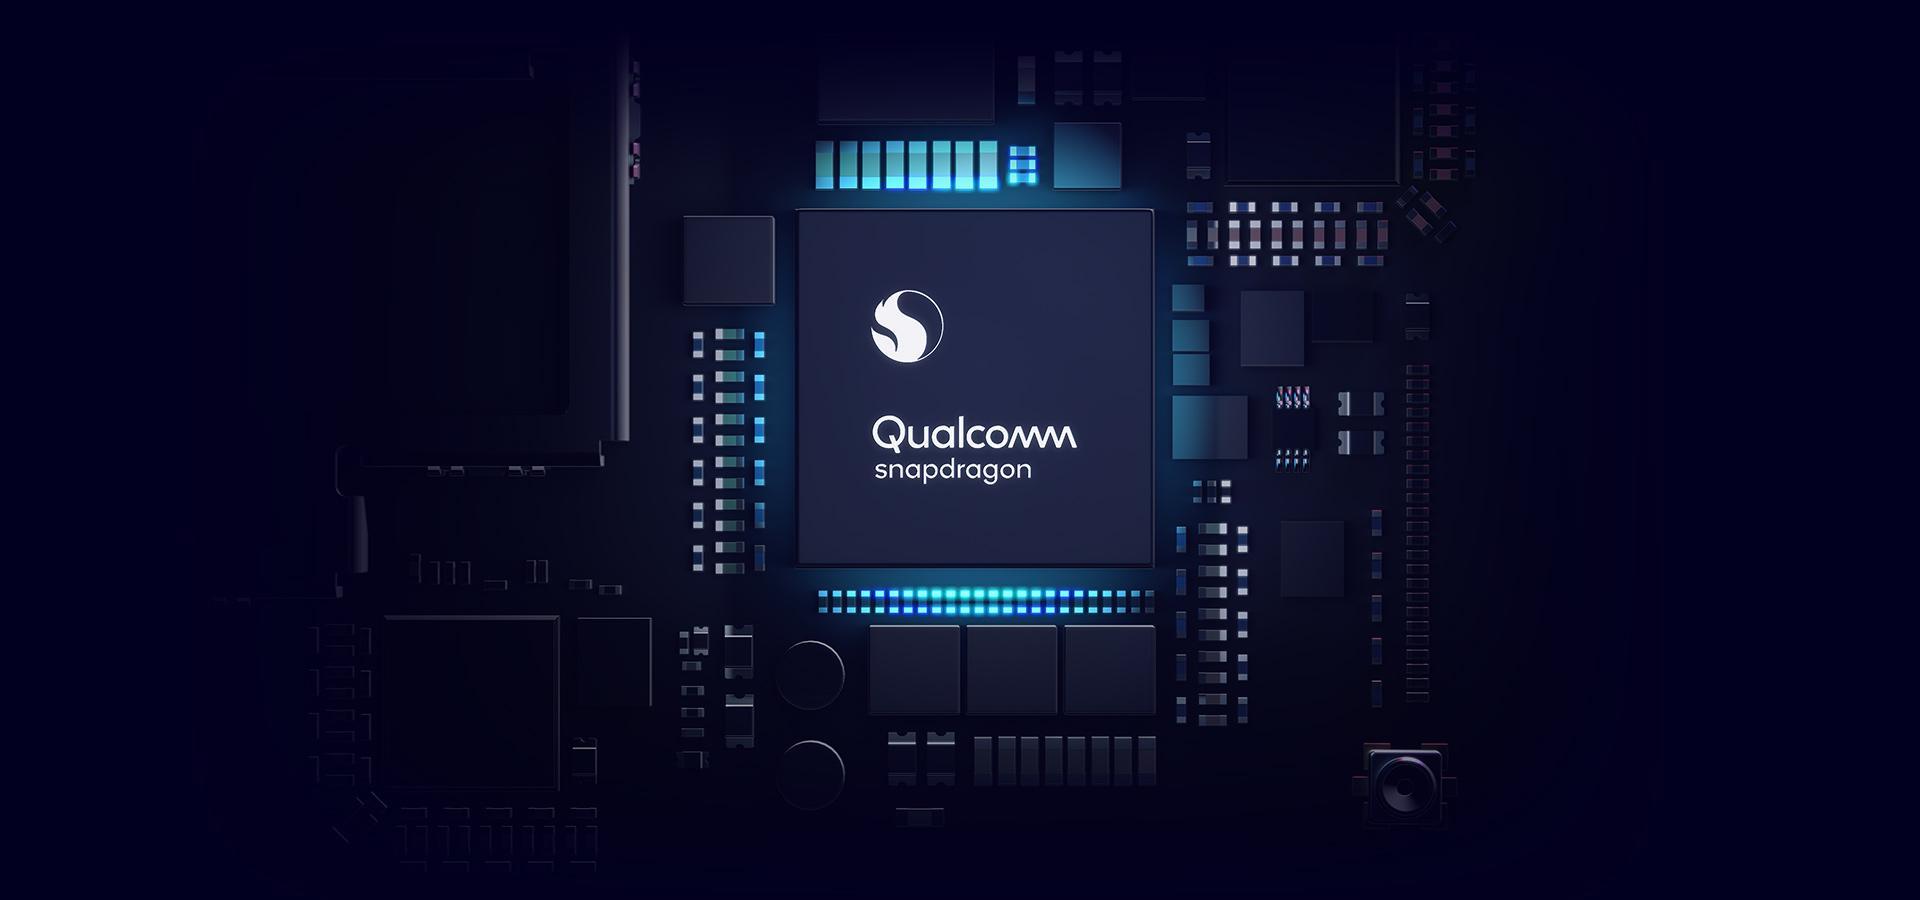 Названы смартфоны, которые выйдут на Snapdragon 888